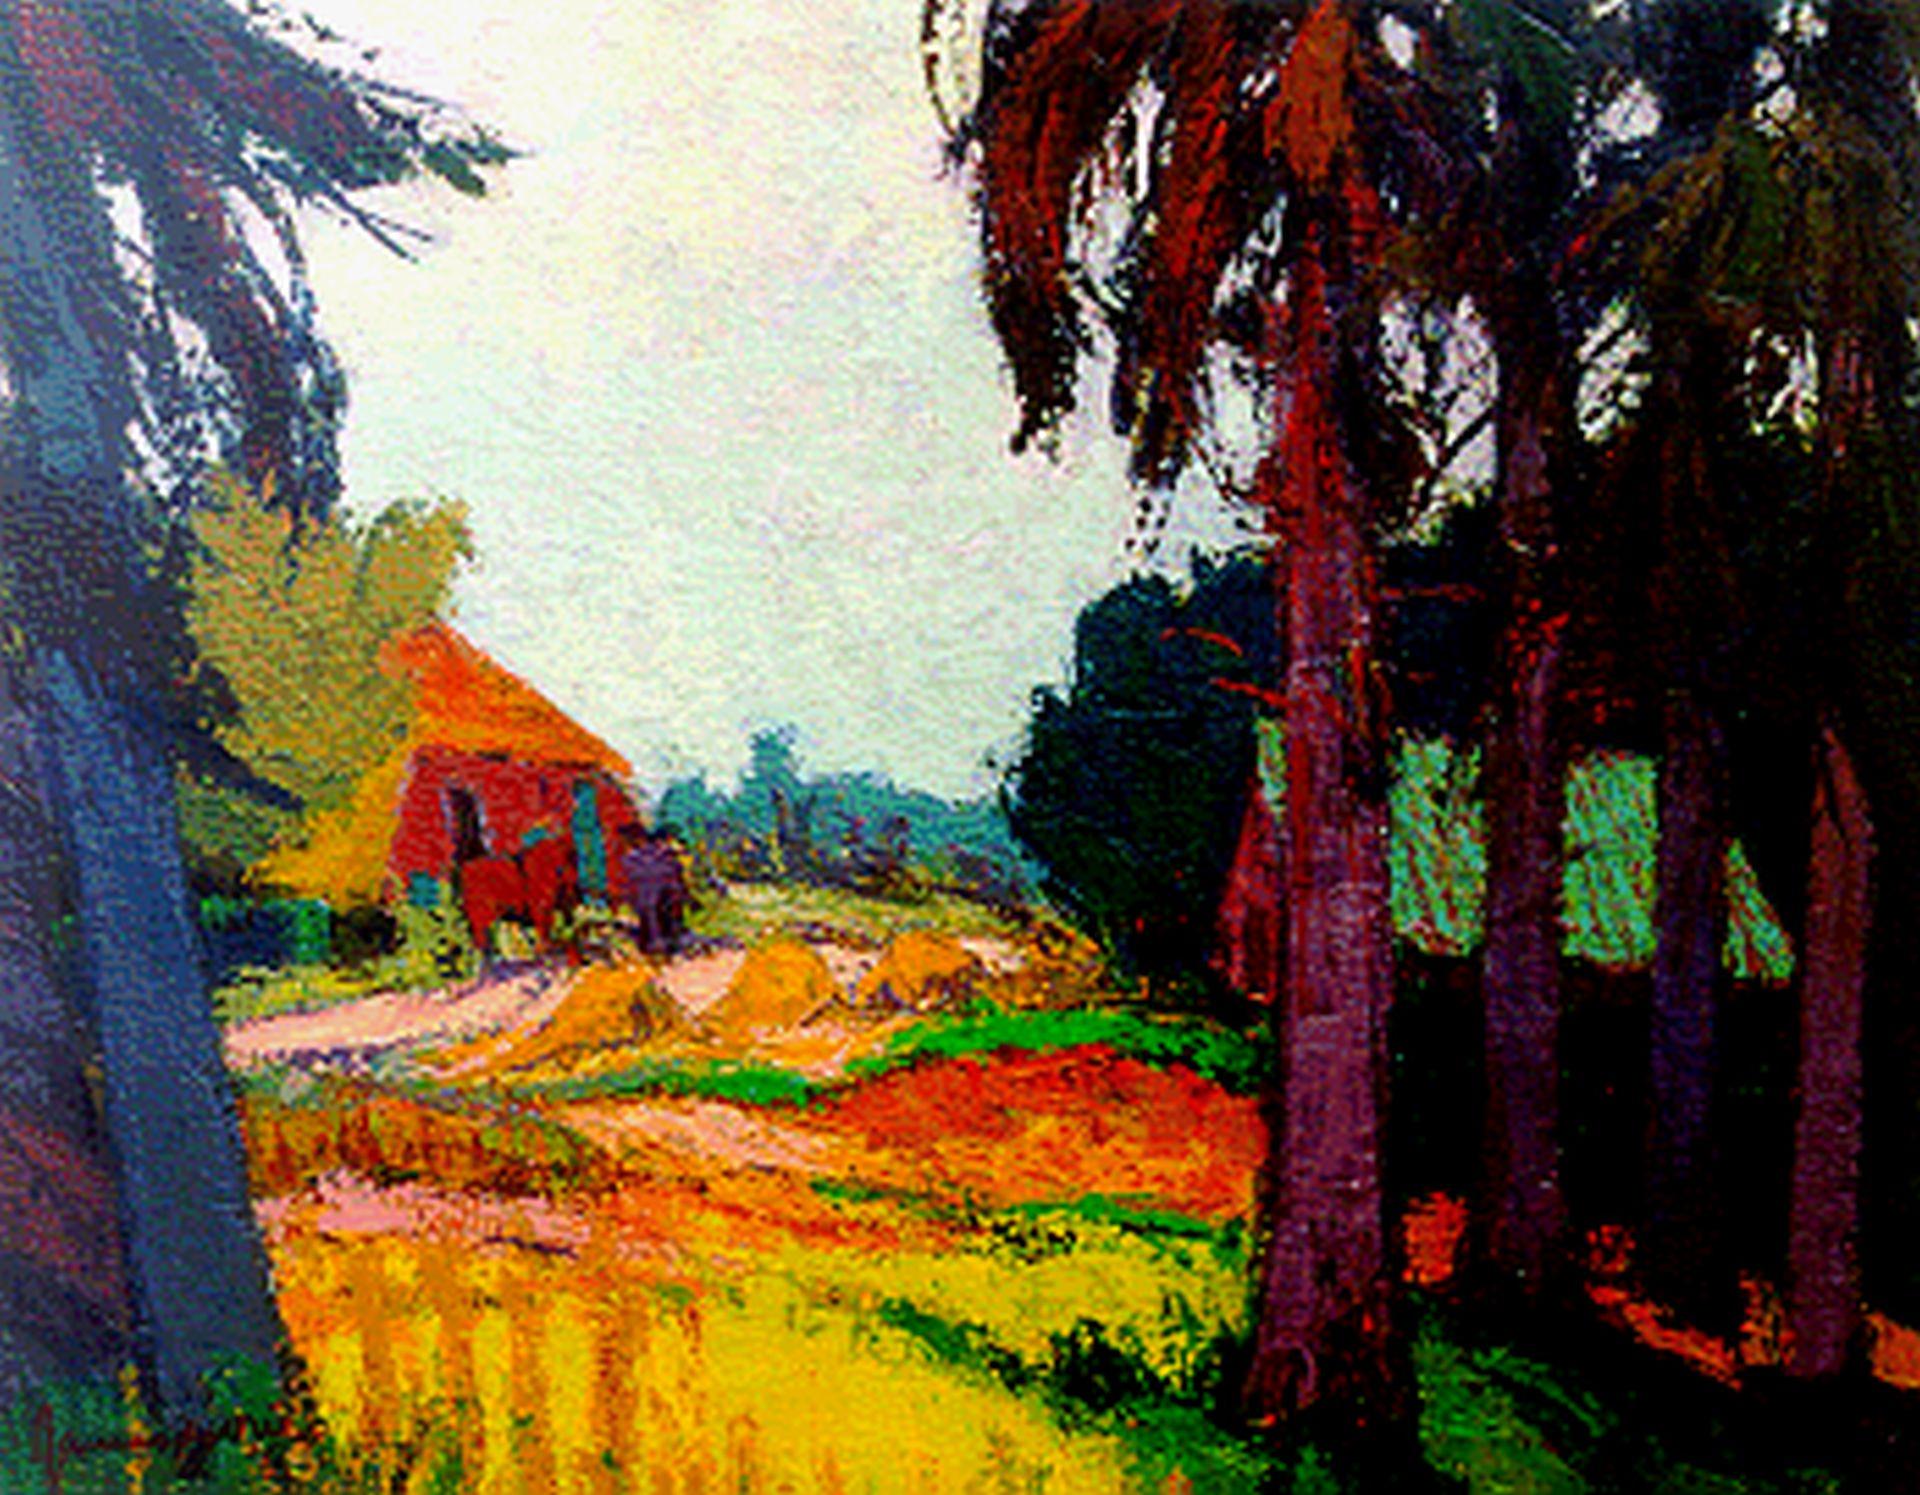 Vries J. de - Boerderij, olieverf op doek 70,6 x 90,5 cm, gesigneerd l.o. en gedateerd '63